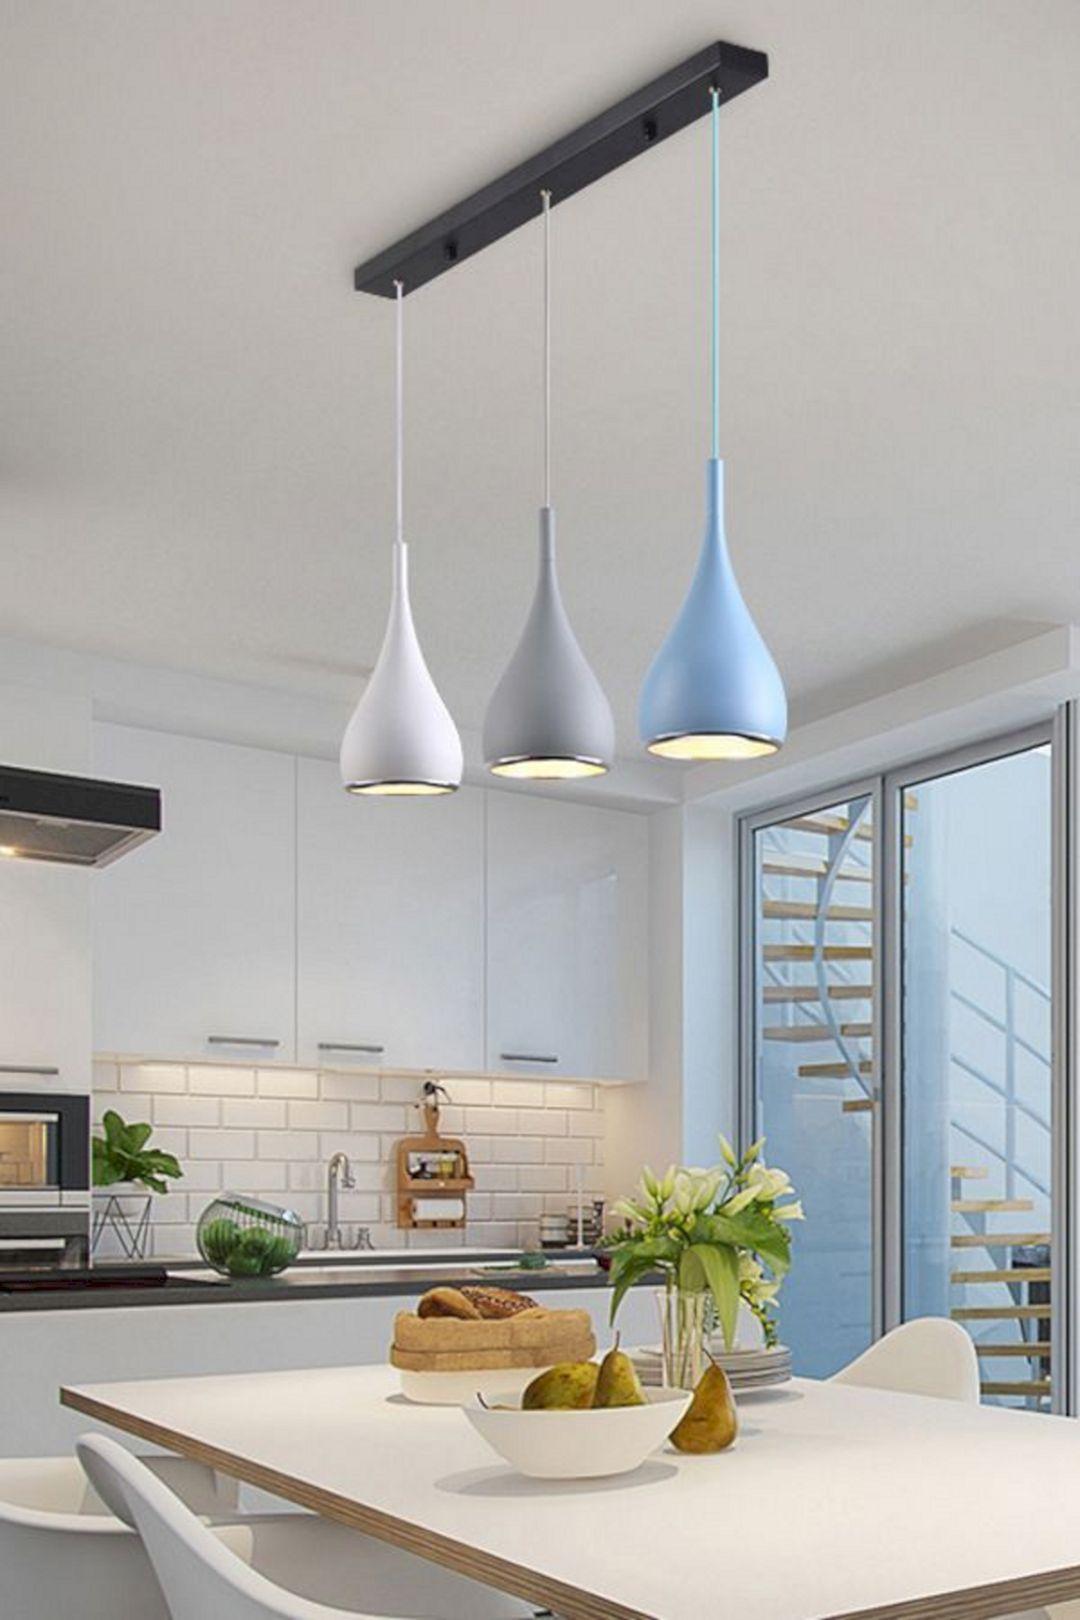 10 Minimalist Kitchen Lamp Ideas That Look More Beautiful